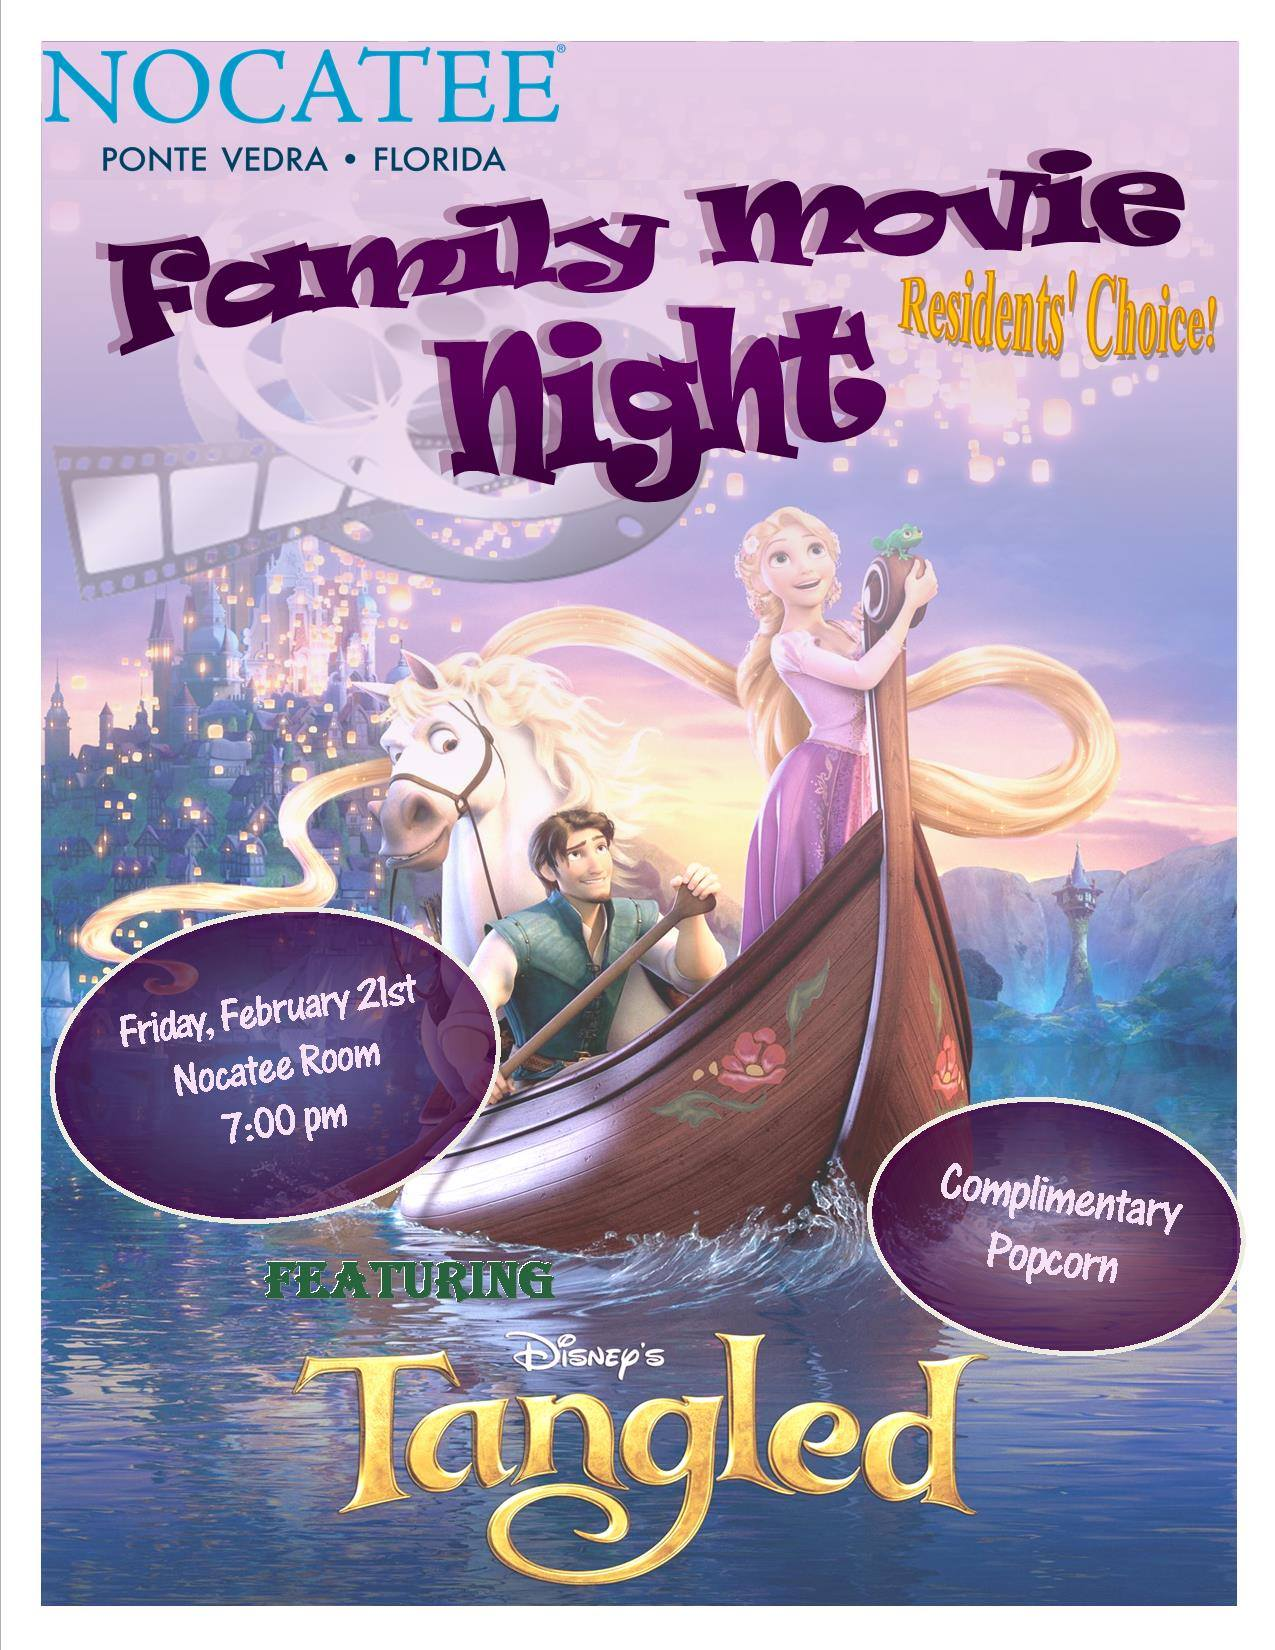 Disney's Tangled - Nocatee's Family Movie Night